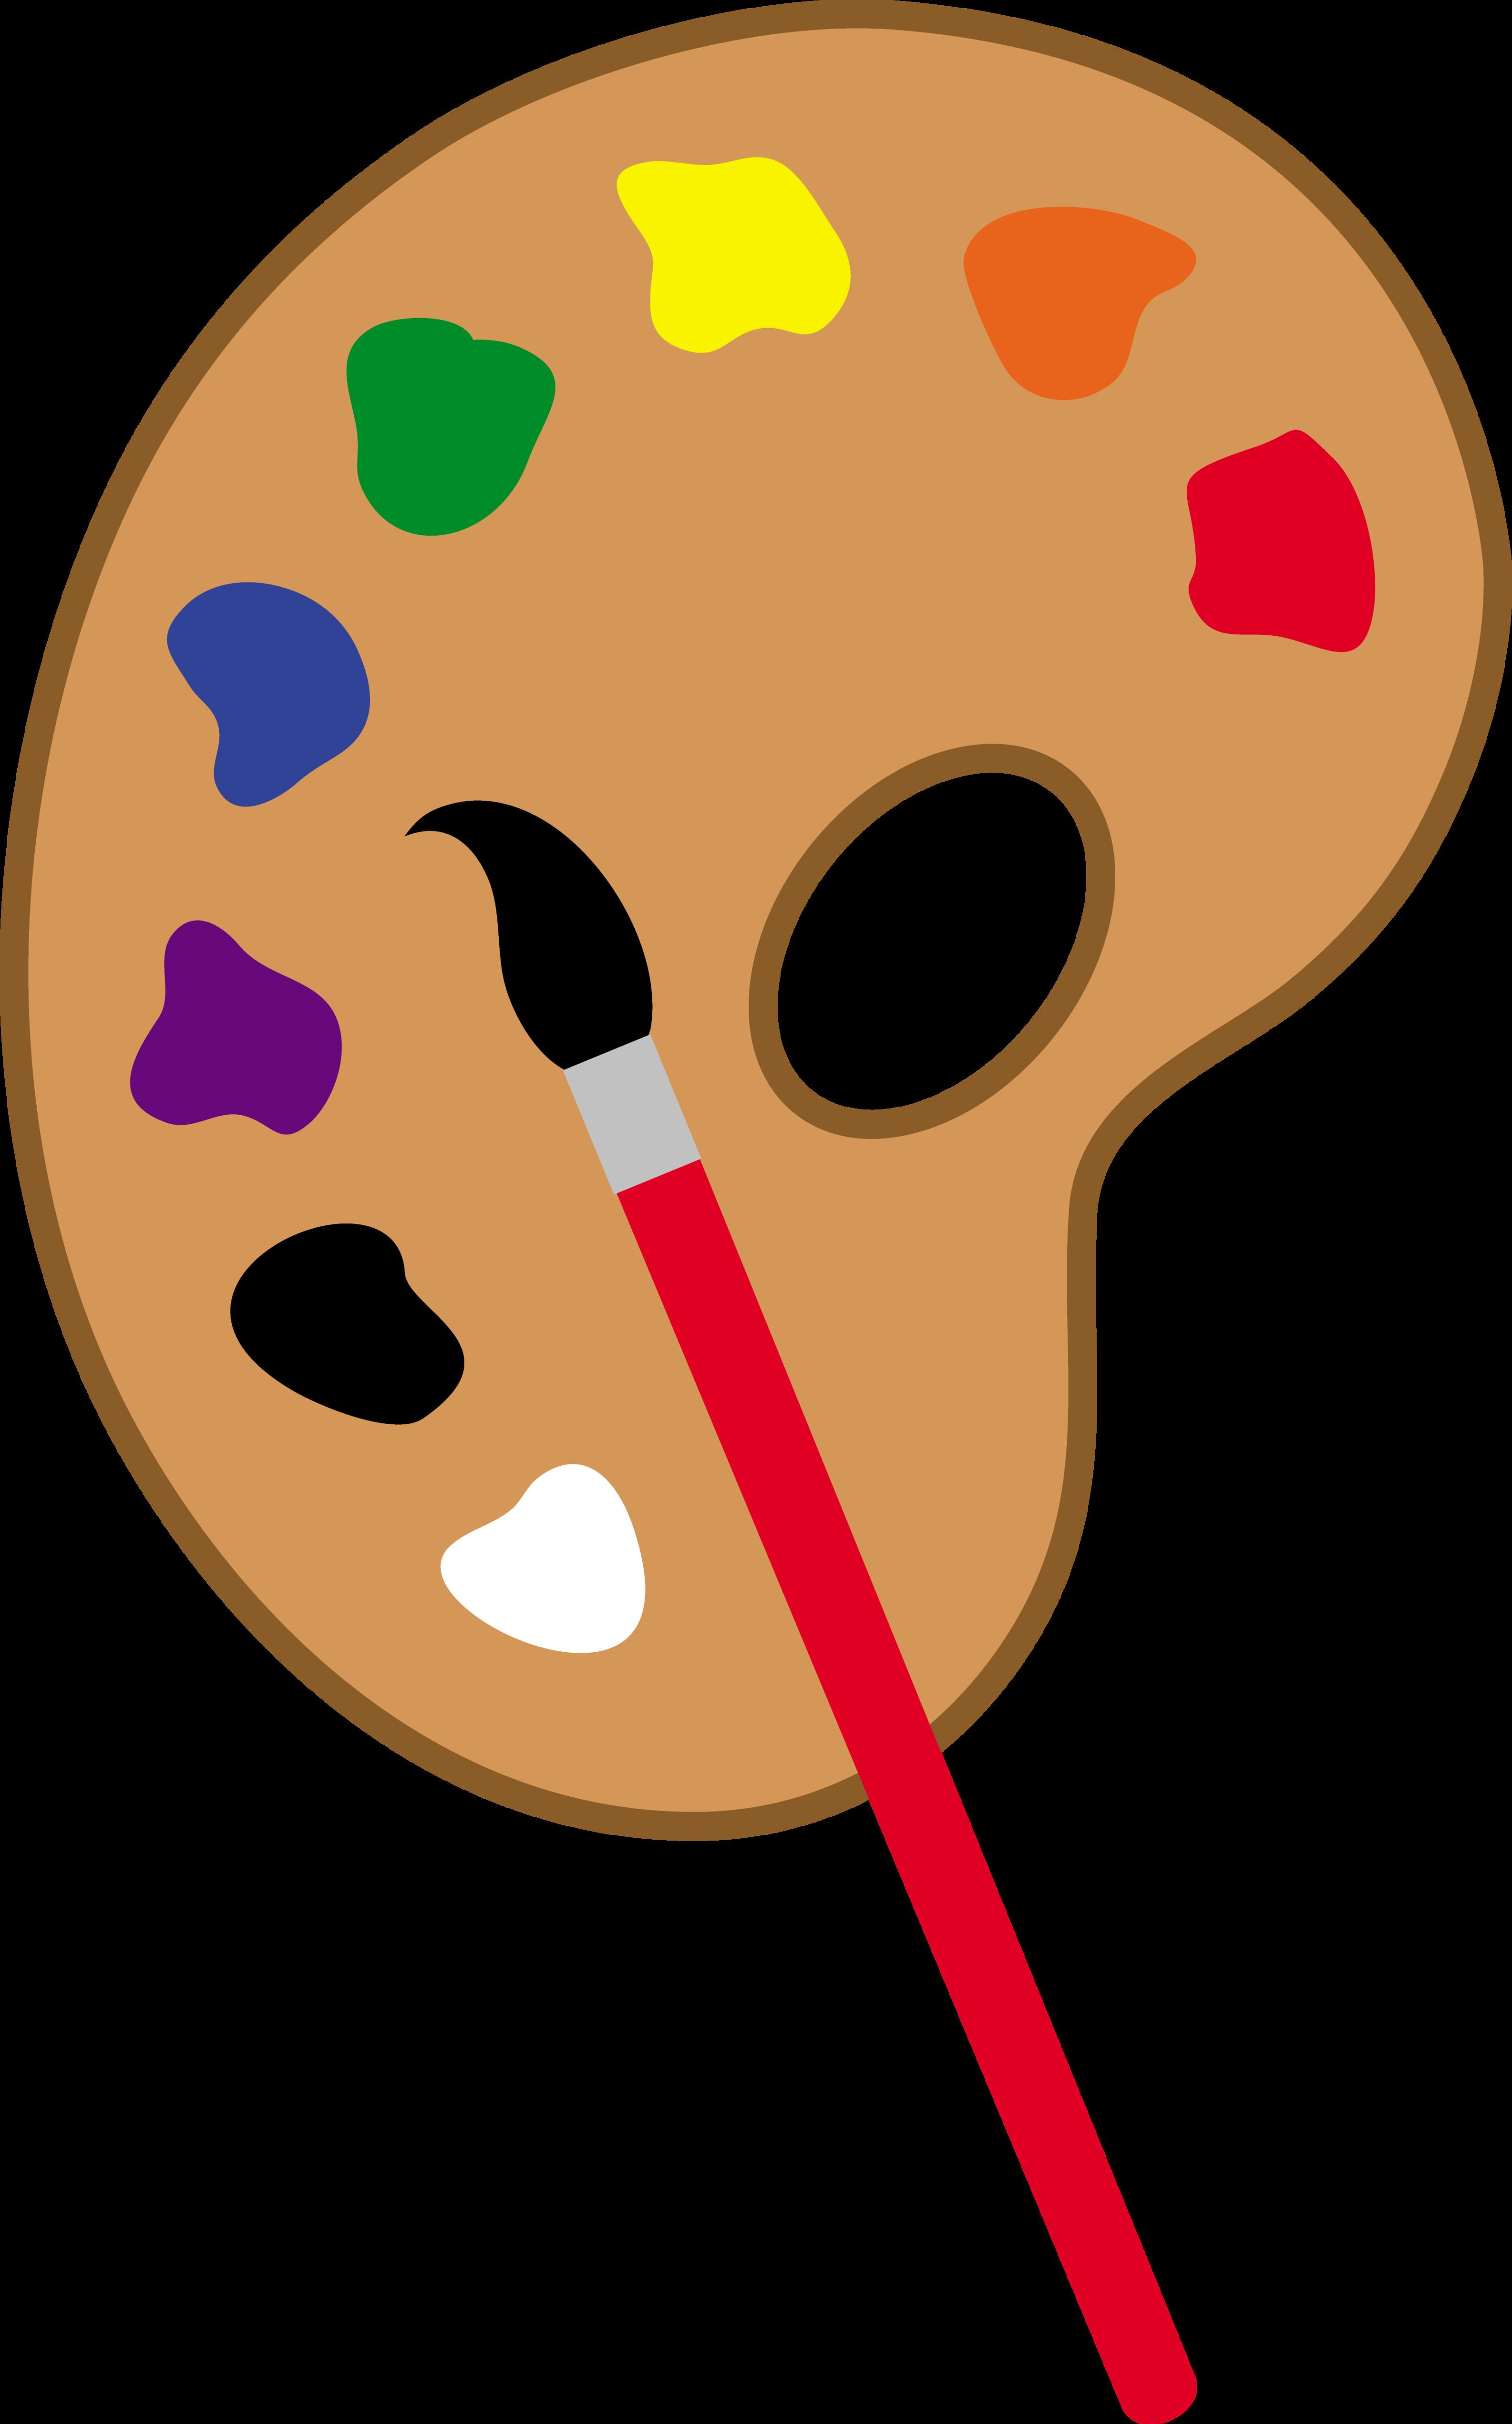 Paint Palette Clip Art-Paint Palette Clip Art-13